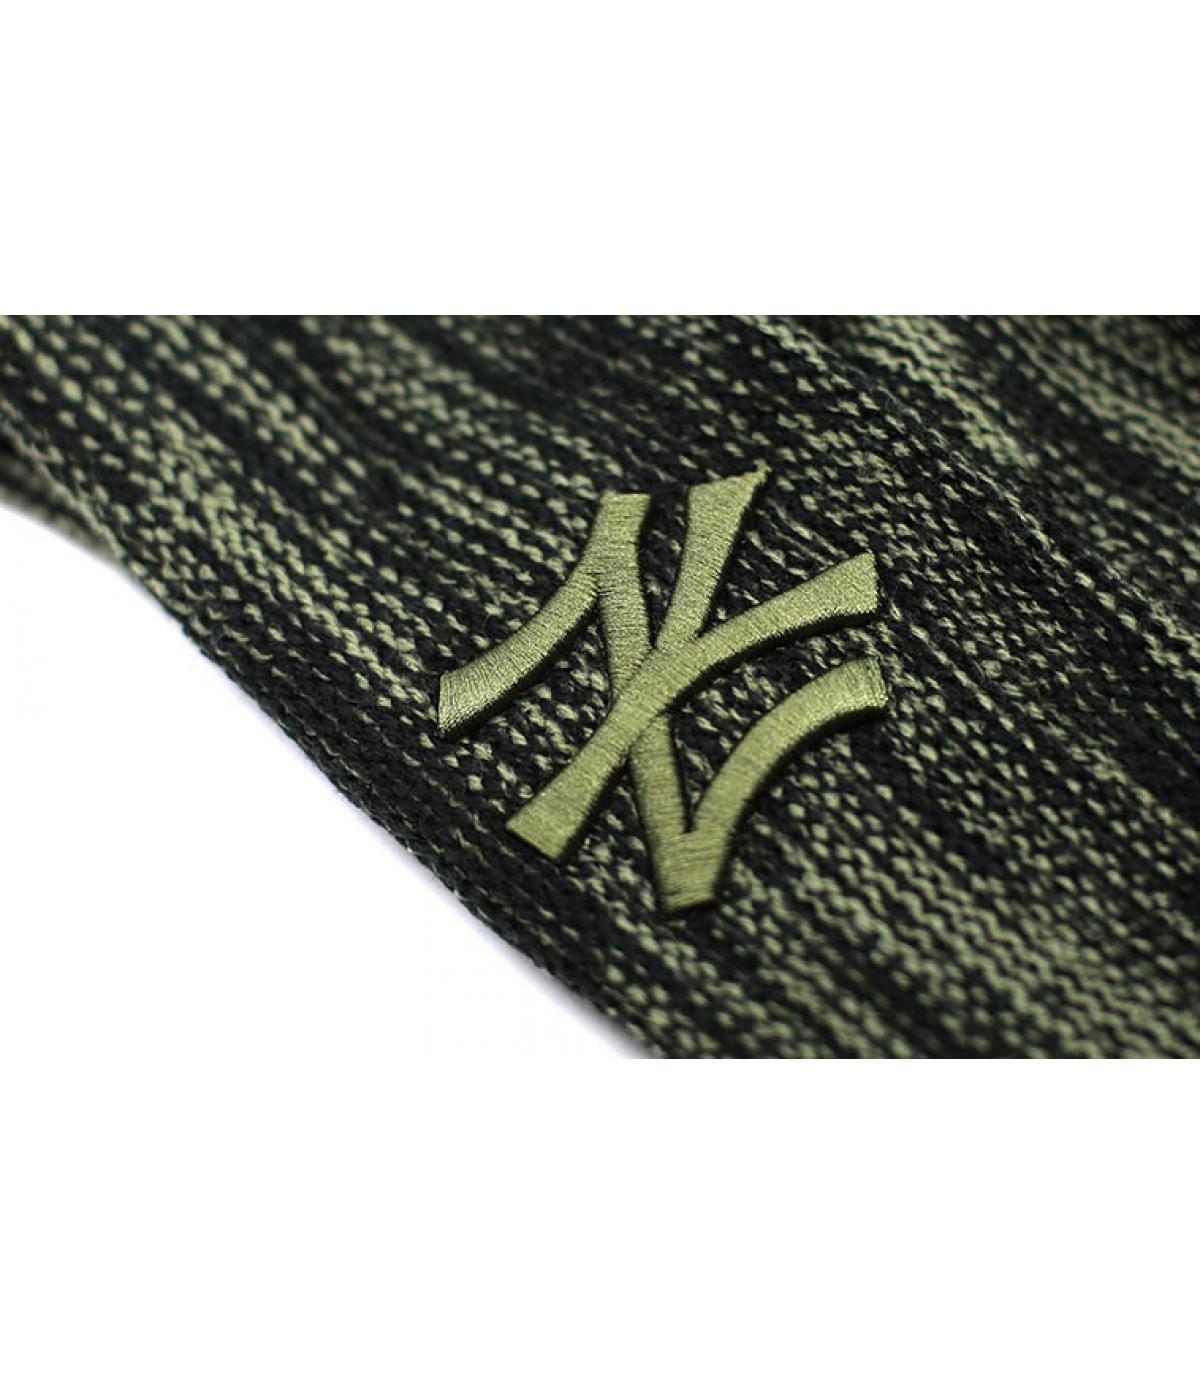 Details Mütze NY Marl Knit black Olive - Abbildung 3